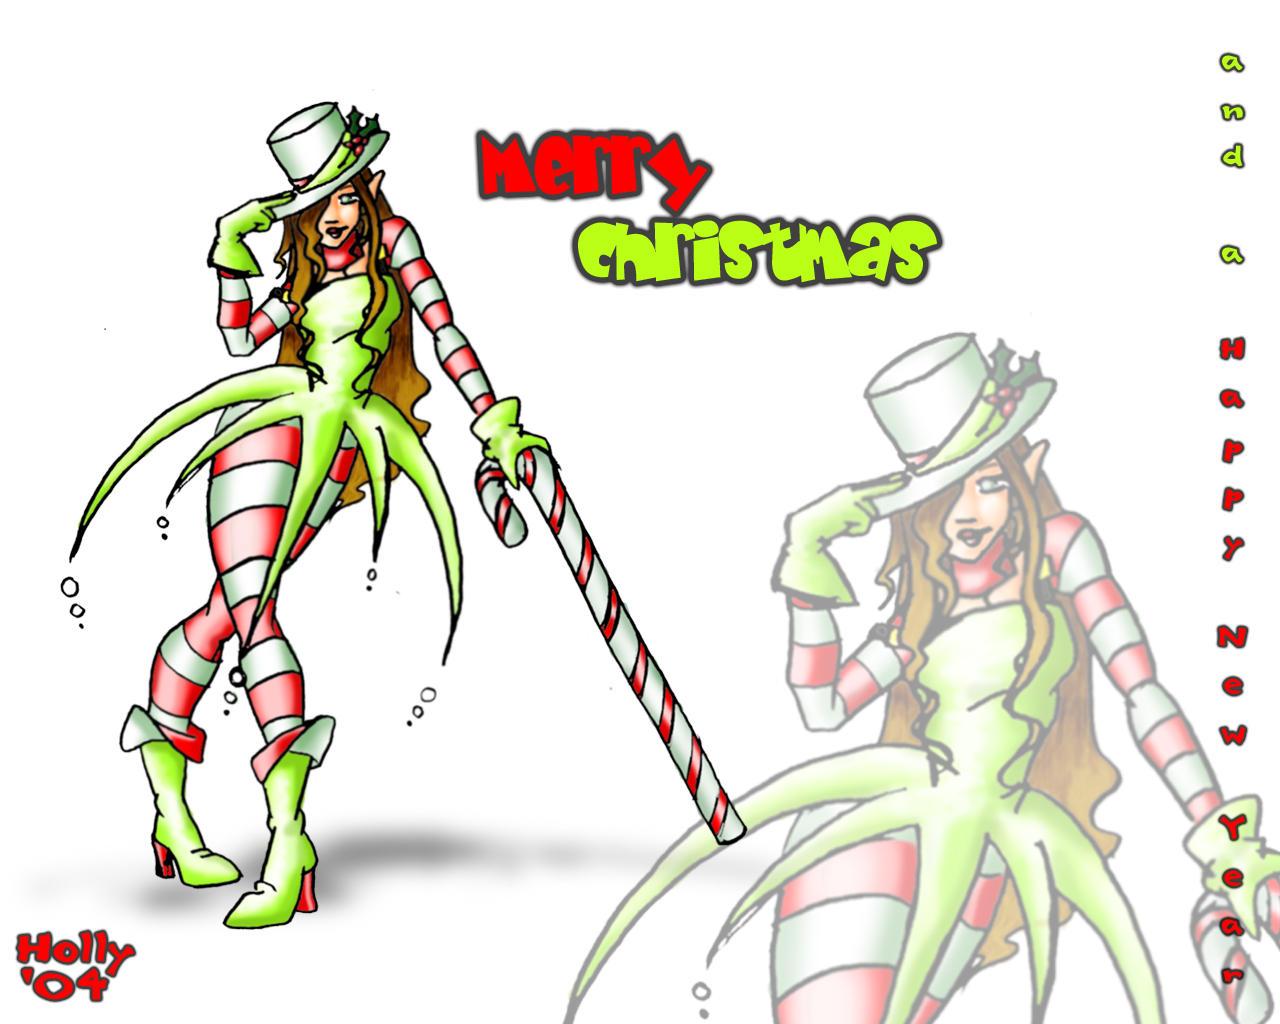 Merry Christmas '04 bg by Horuni